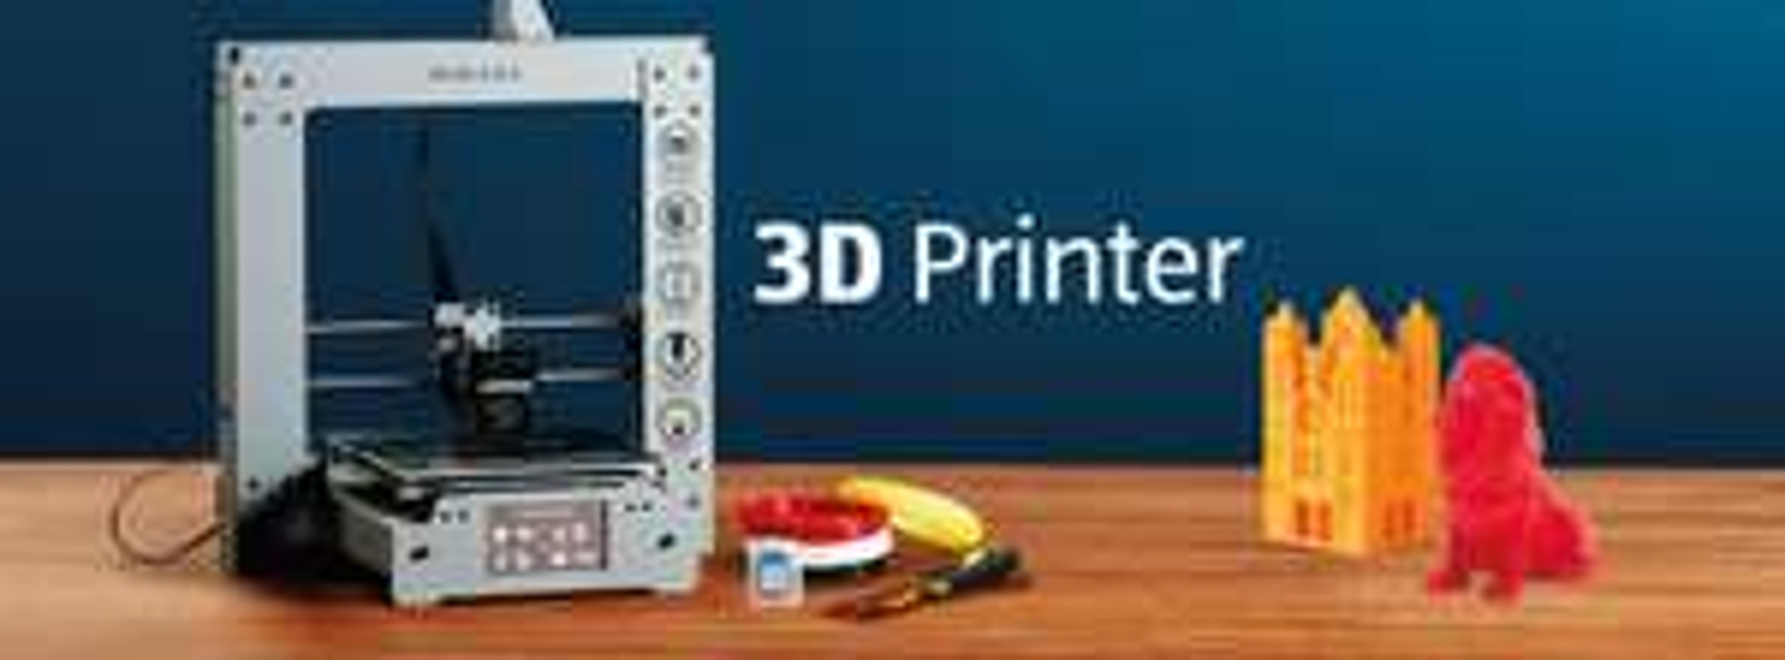 Aldi 3d printer £299.99 - not a bad price